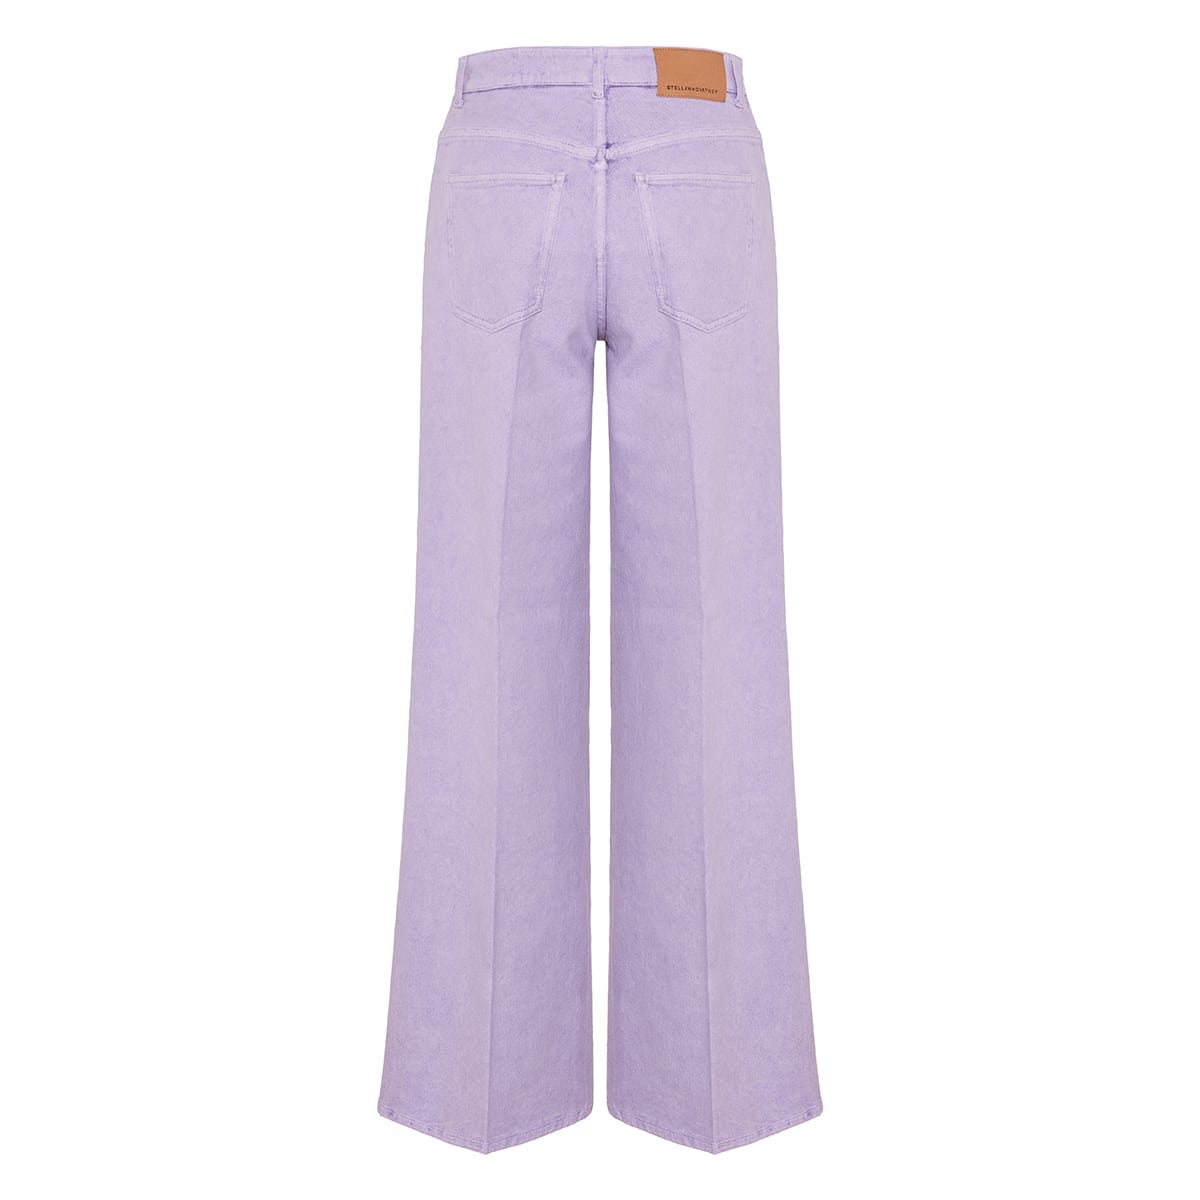 Oversized wide-leg denim trousers